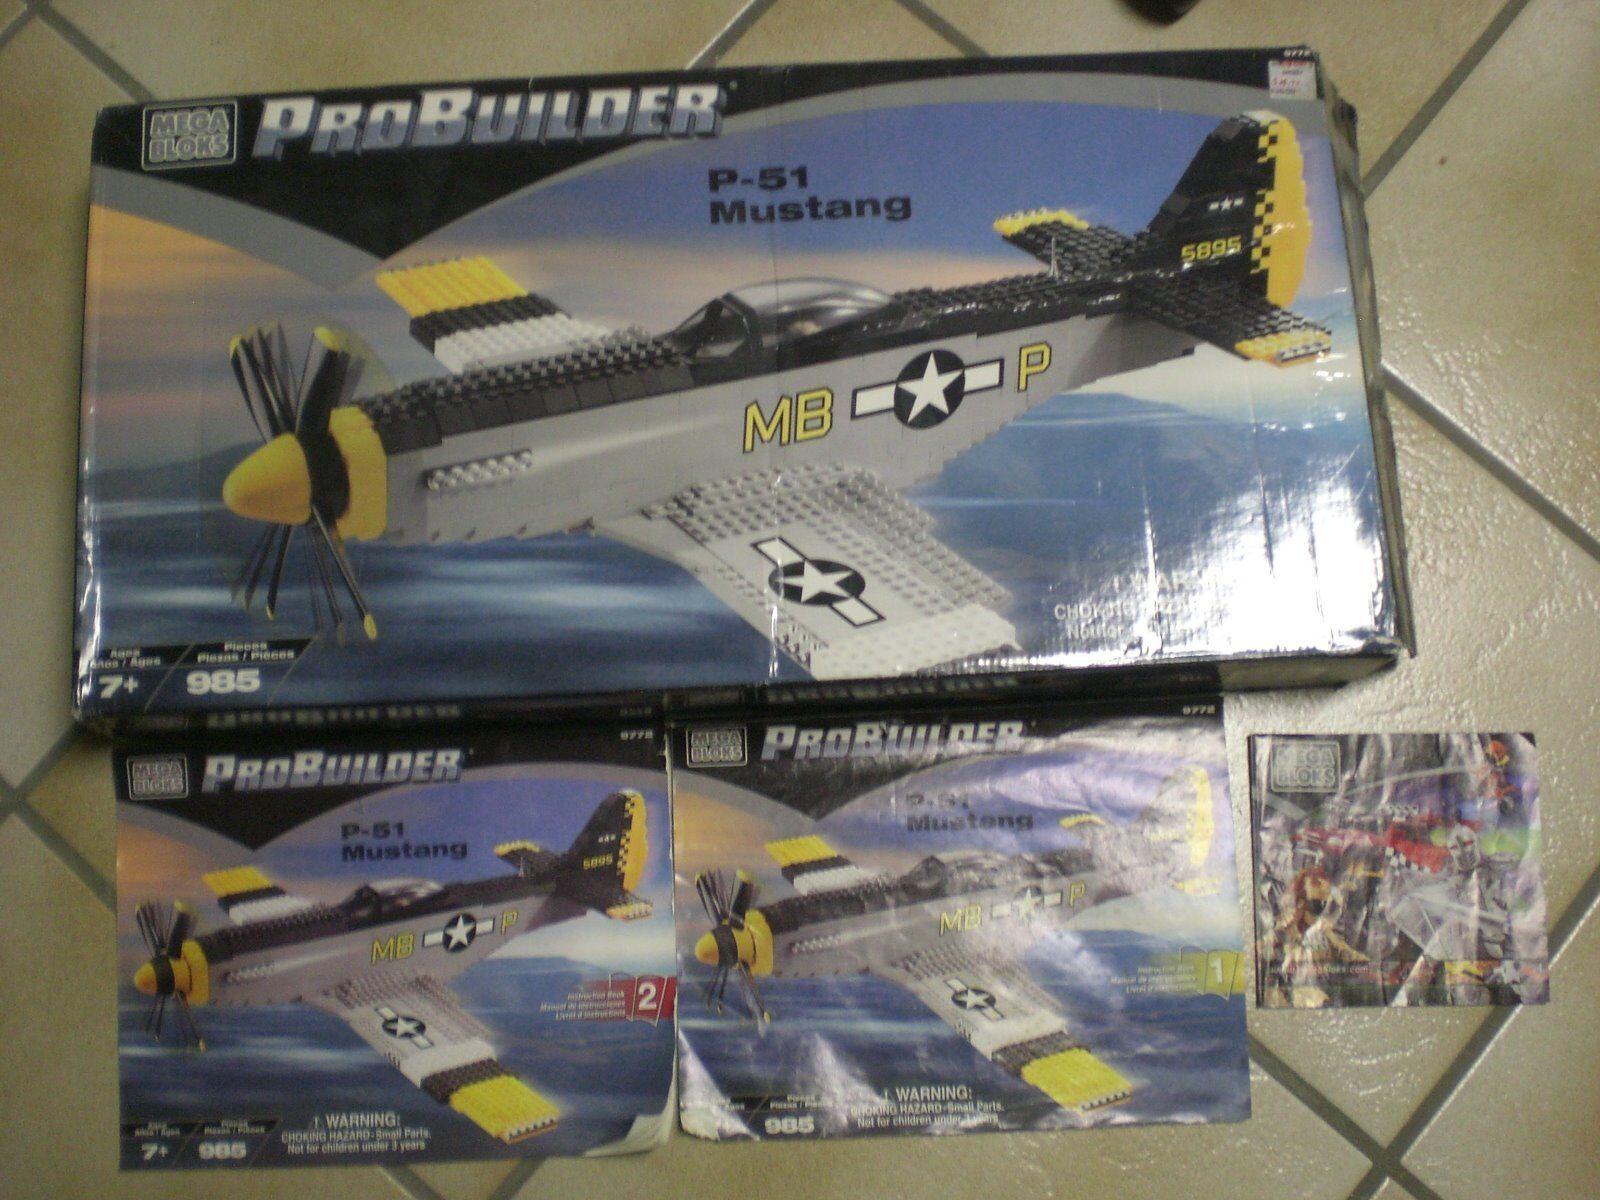 Mega-Bloks 9772 Probuilder P-51 Mustang